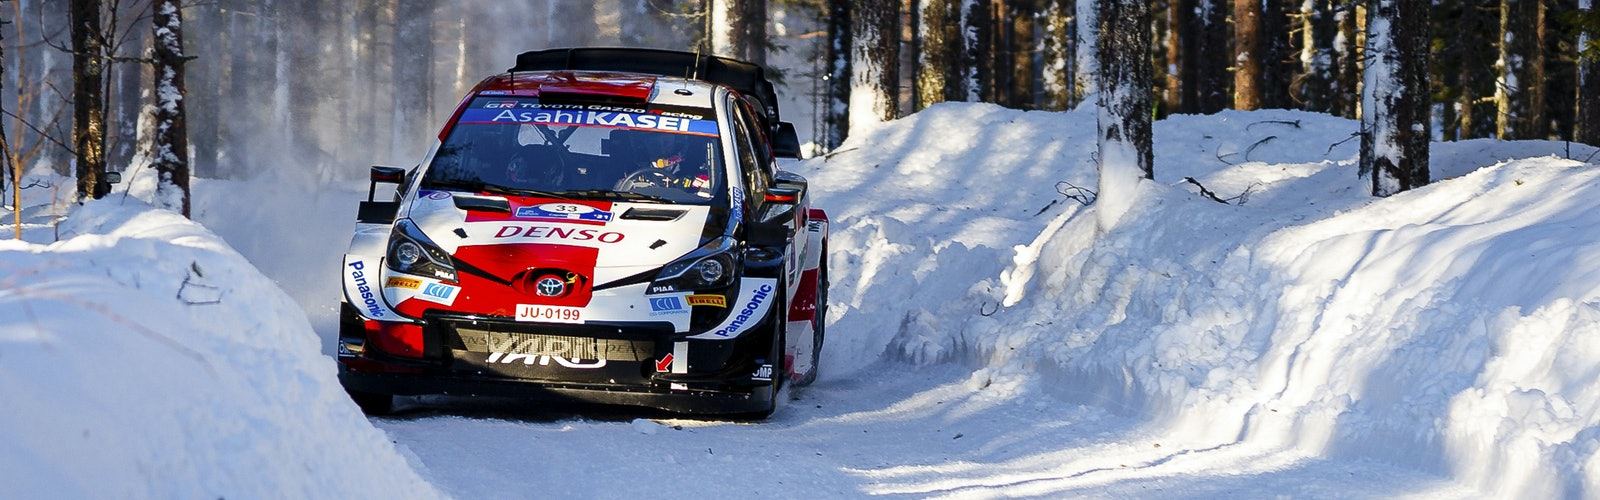 WRC_2021_Rd2._146